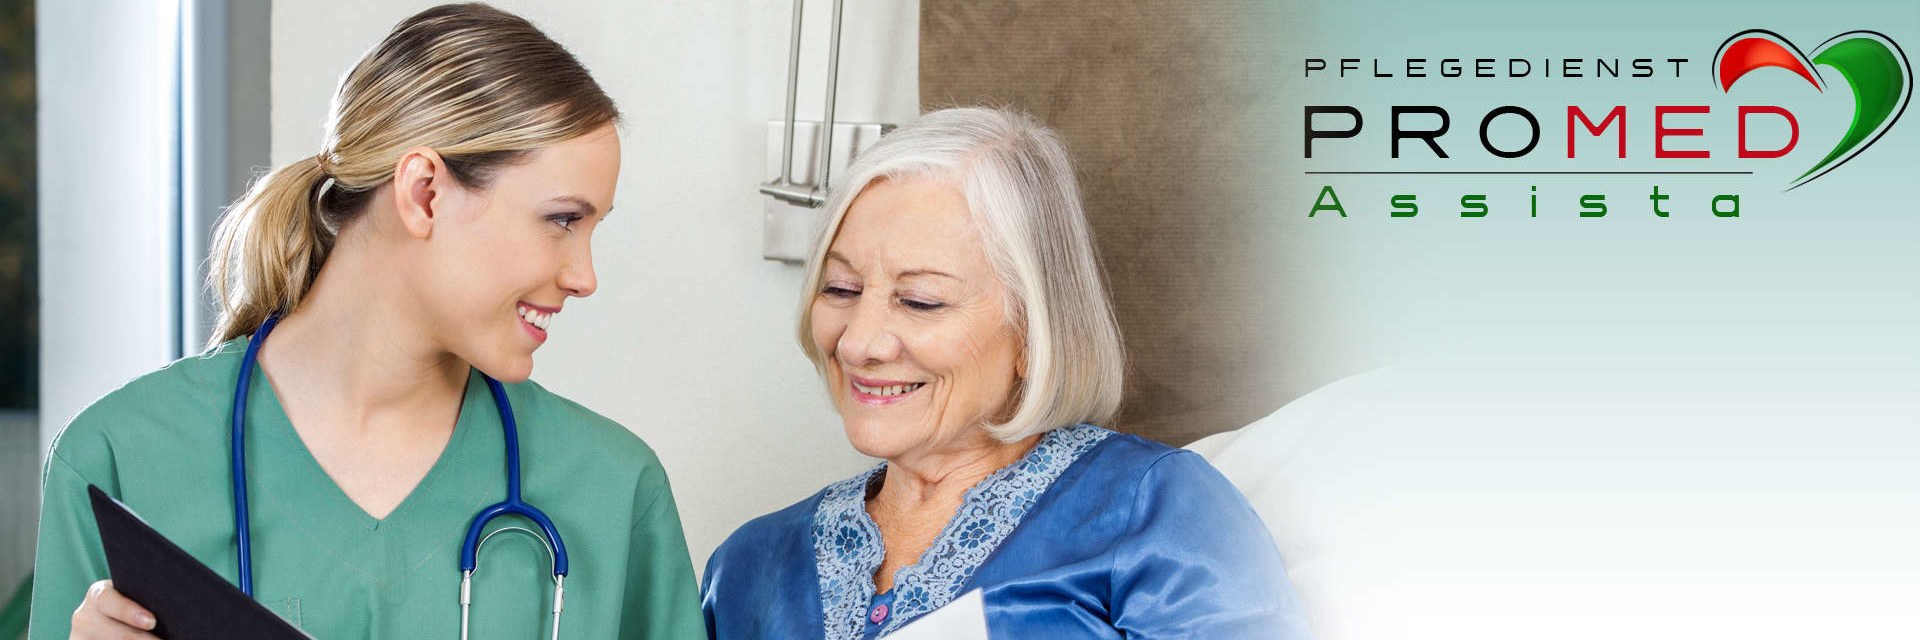 Pflegedienst Promed Assista